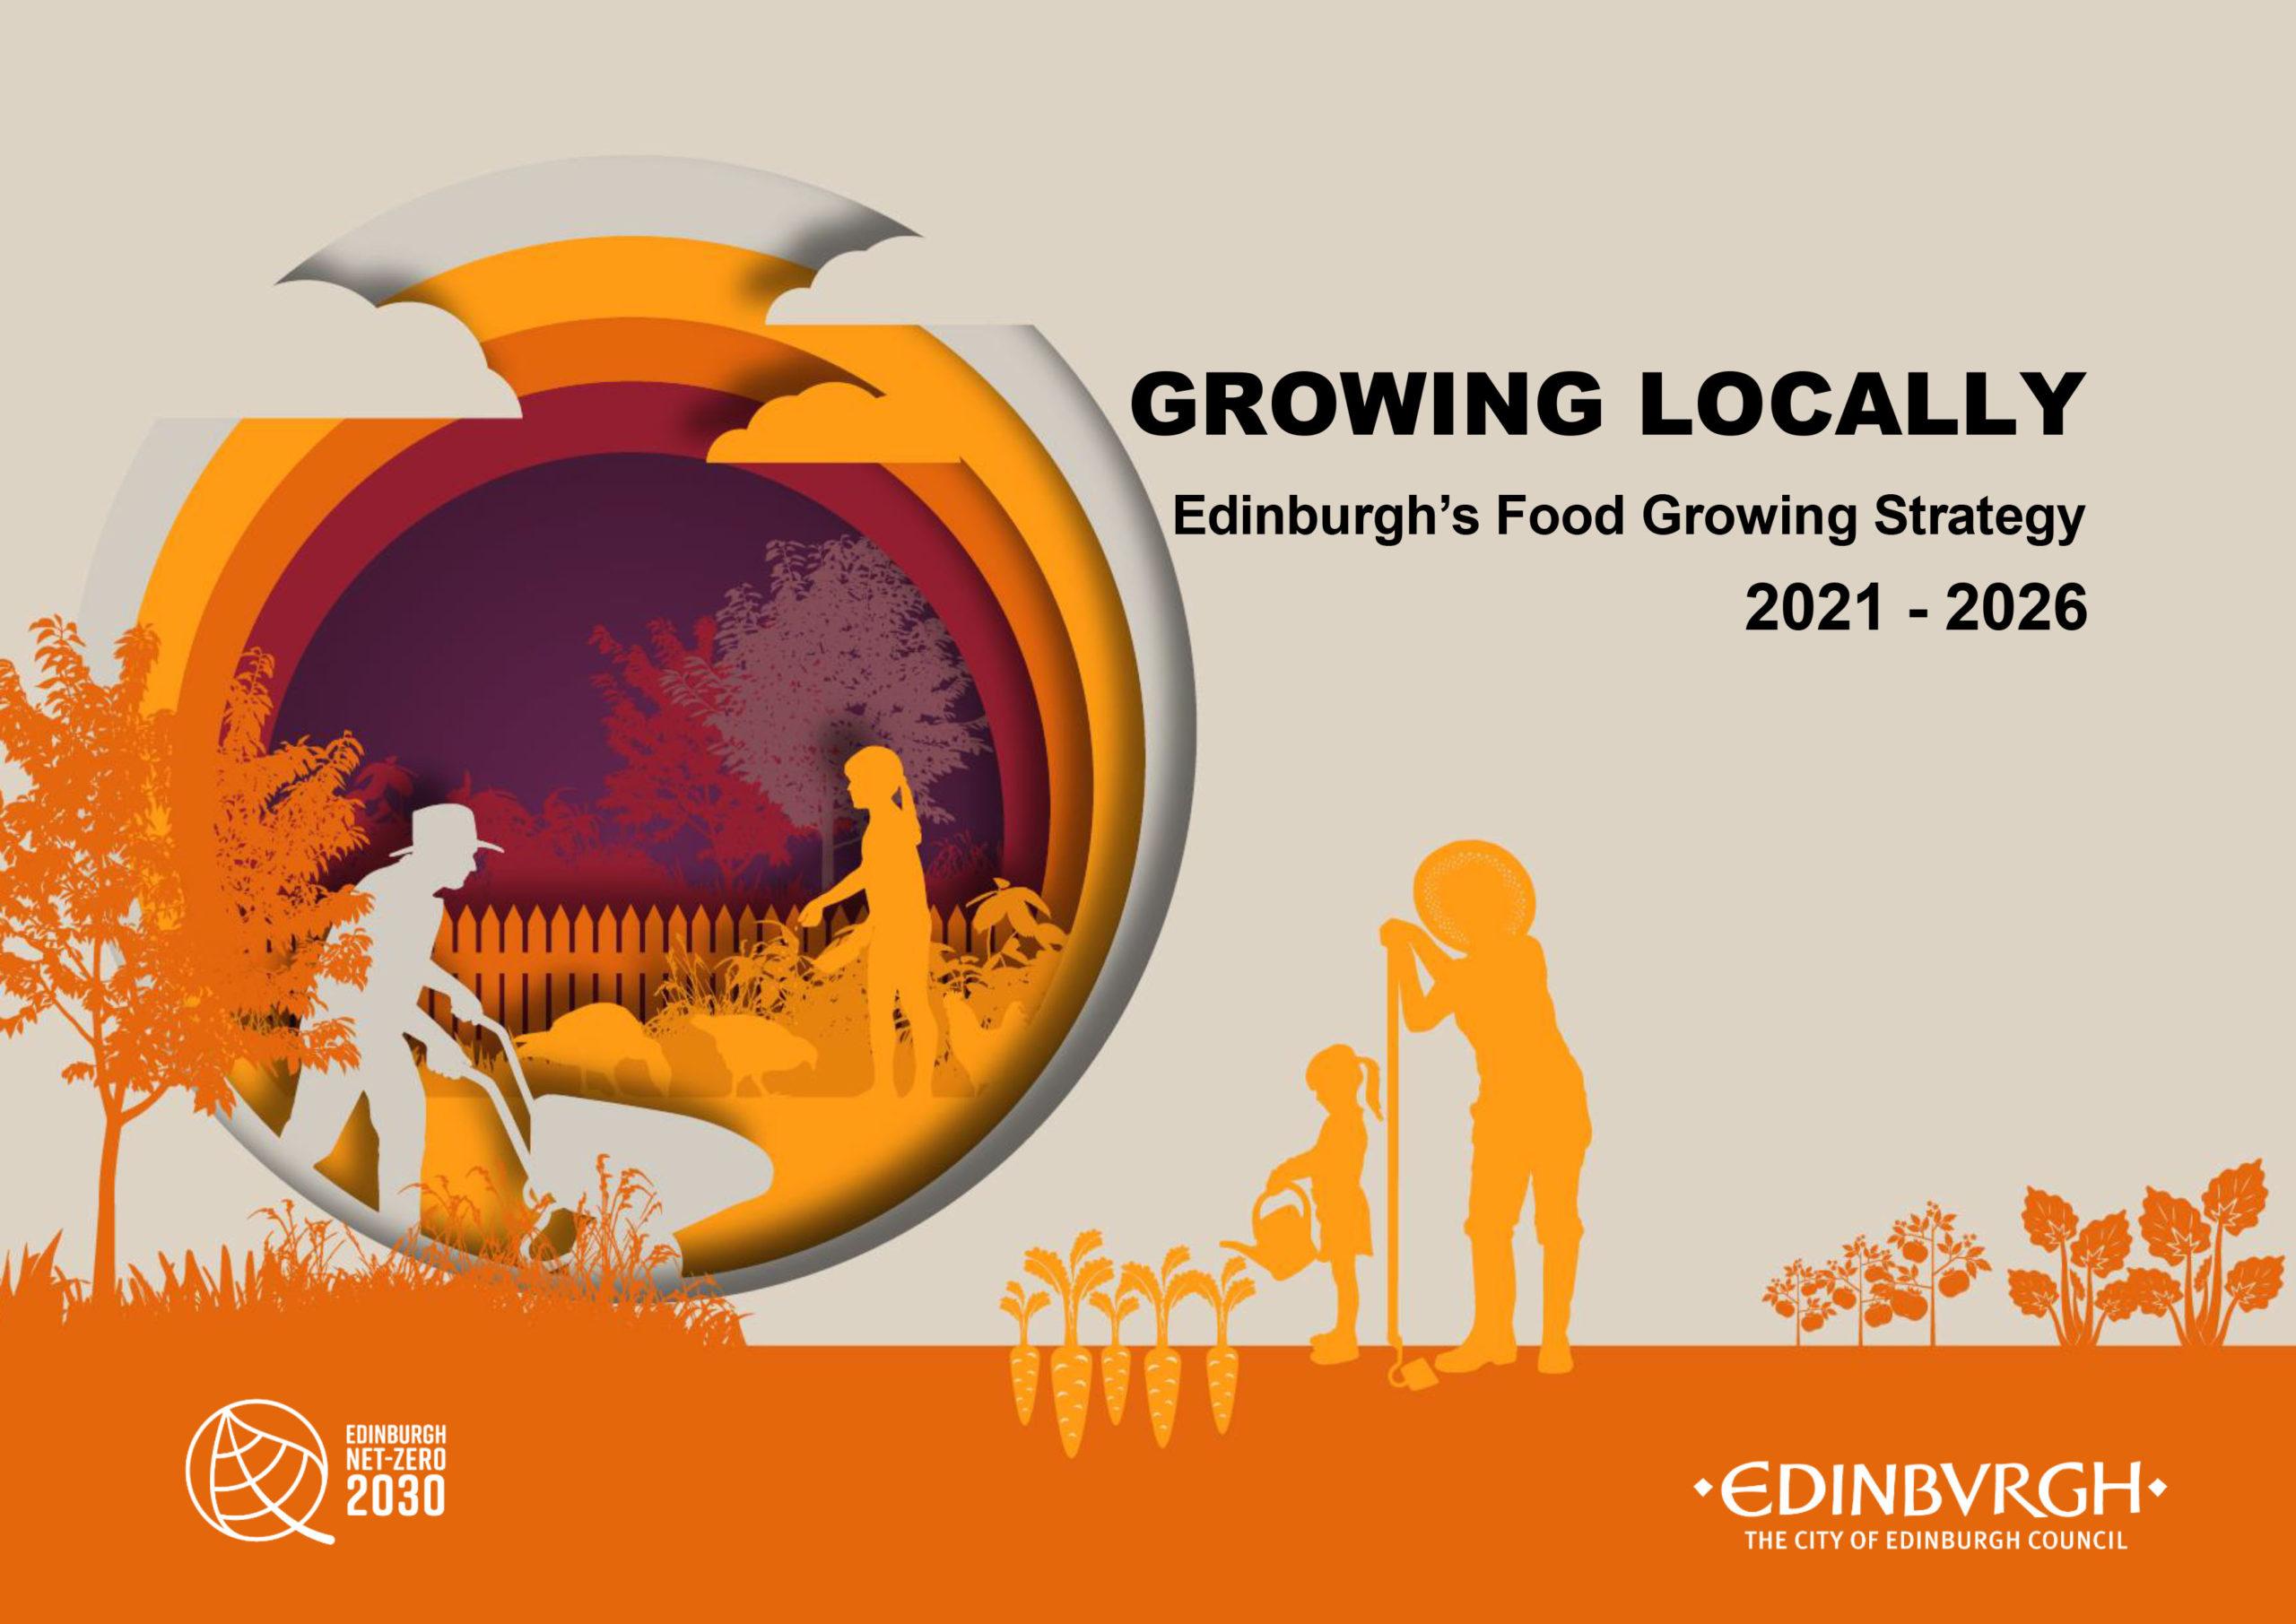 Growing locally: Edinburgh's Food Growing Strategy